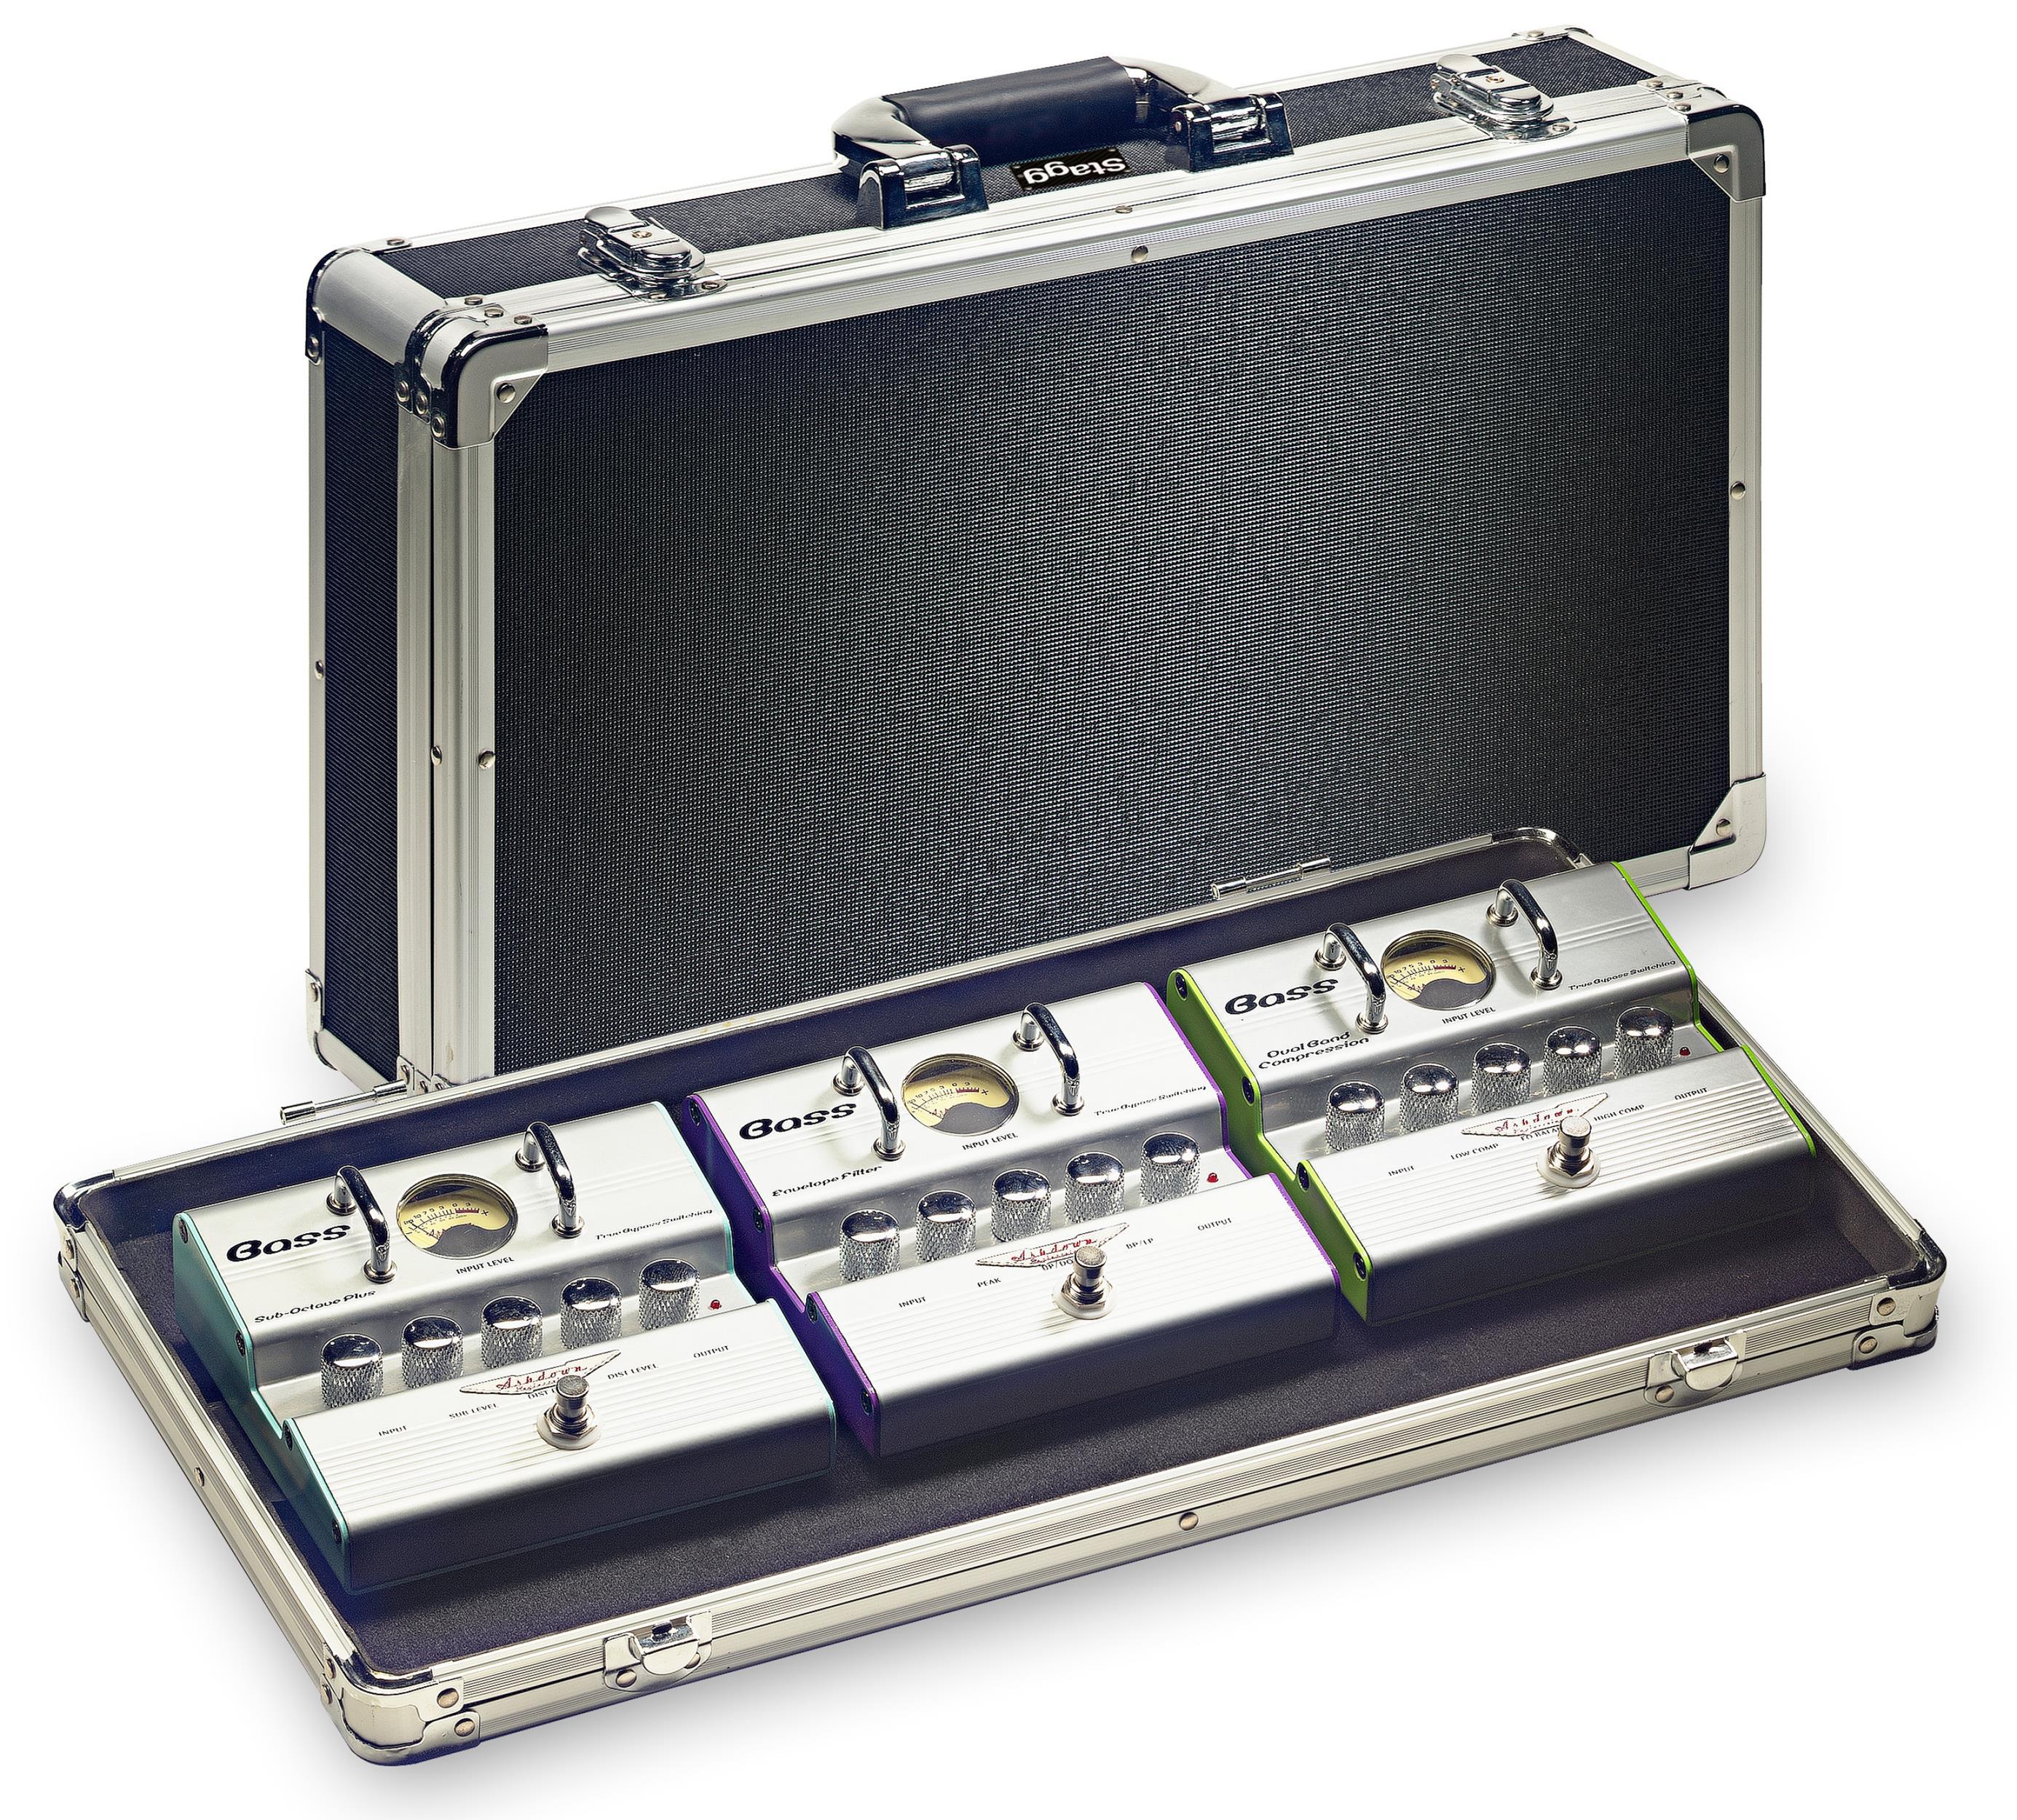 STAGG UPC500 VALIGIA PORTAPEDALI  pedal board